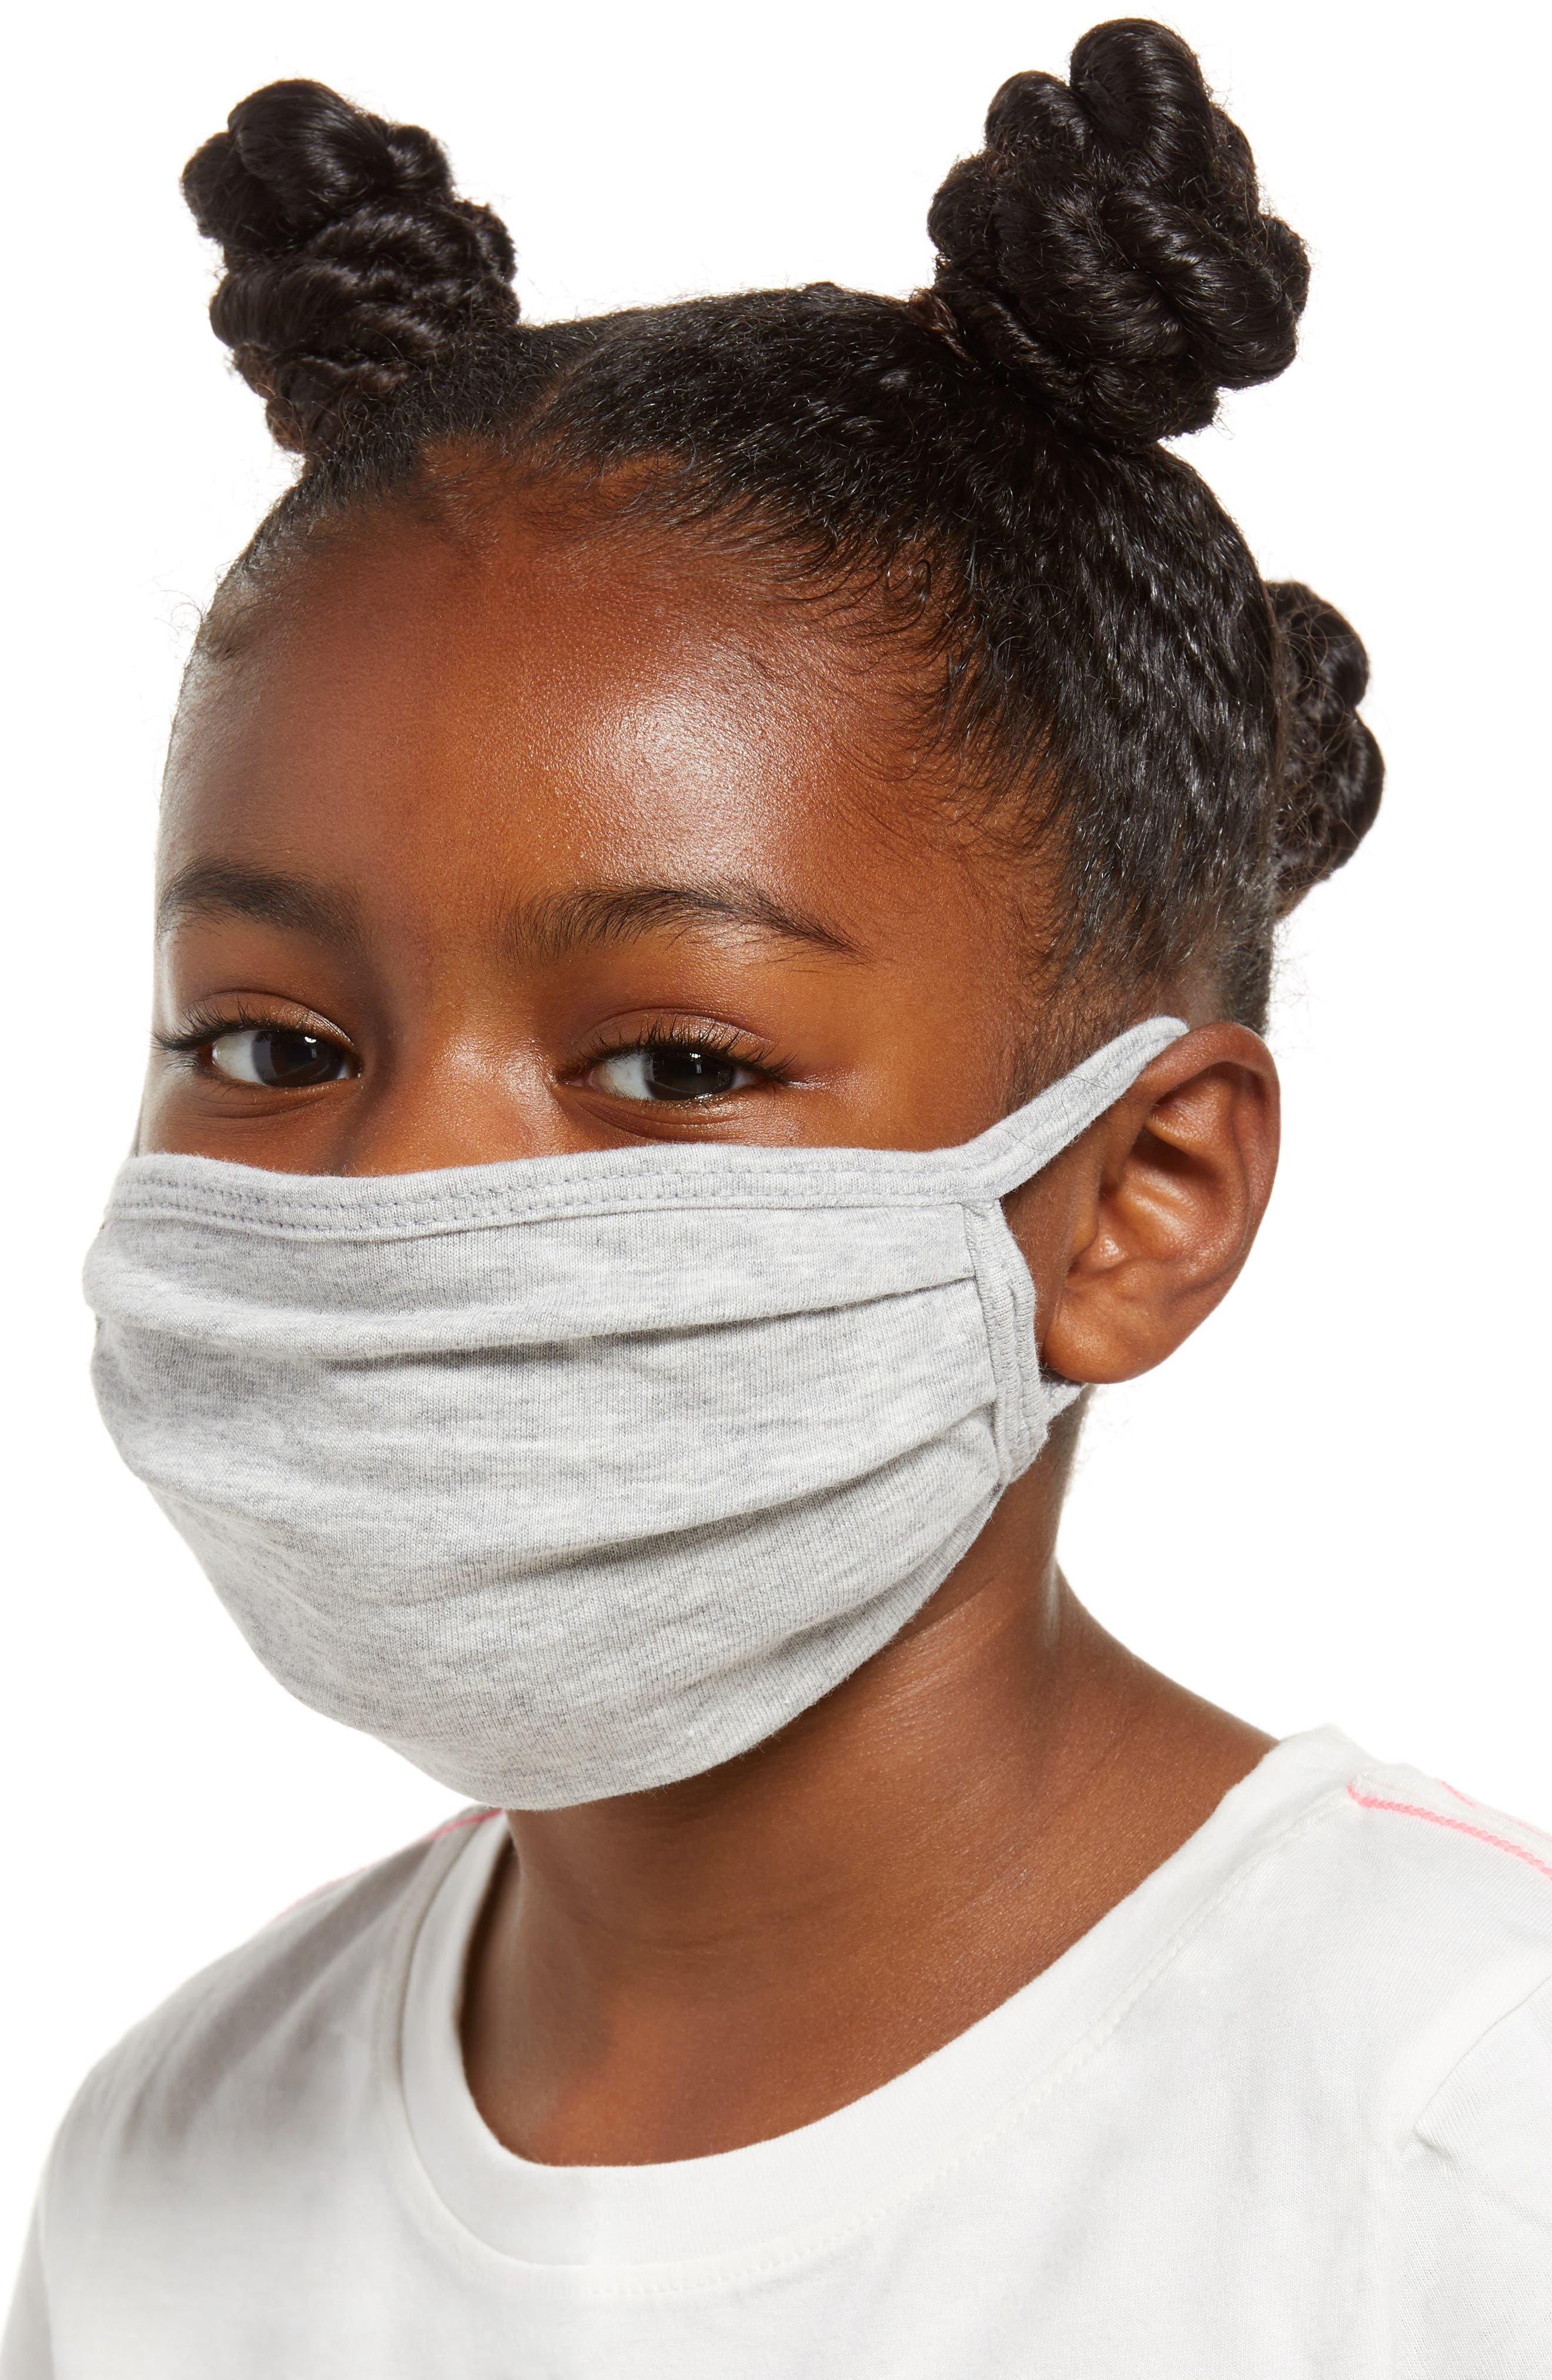 Nordstrom Non-Medical Face Mask - Set of 4